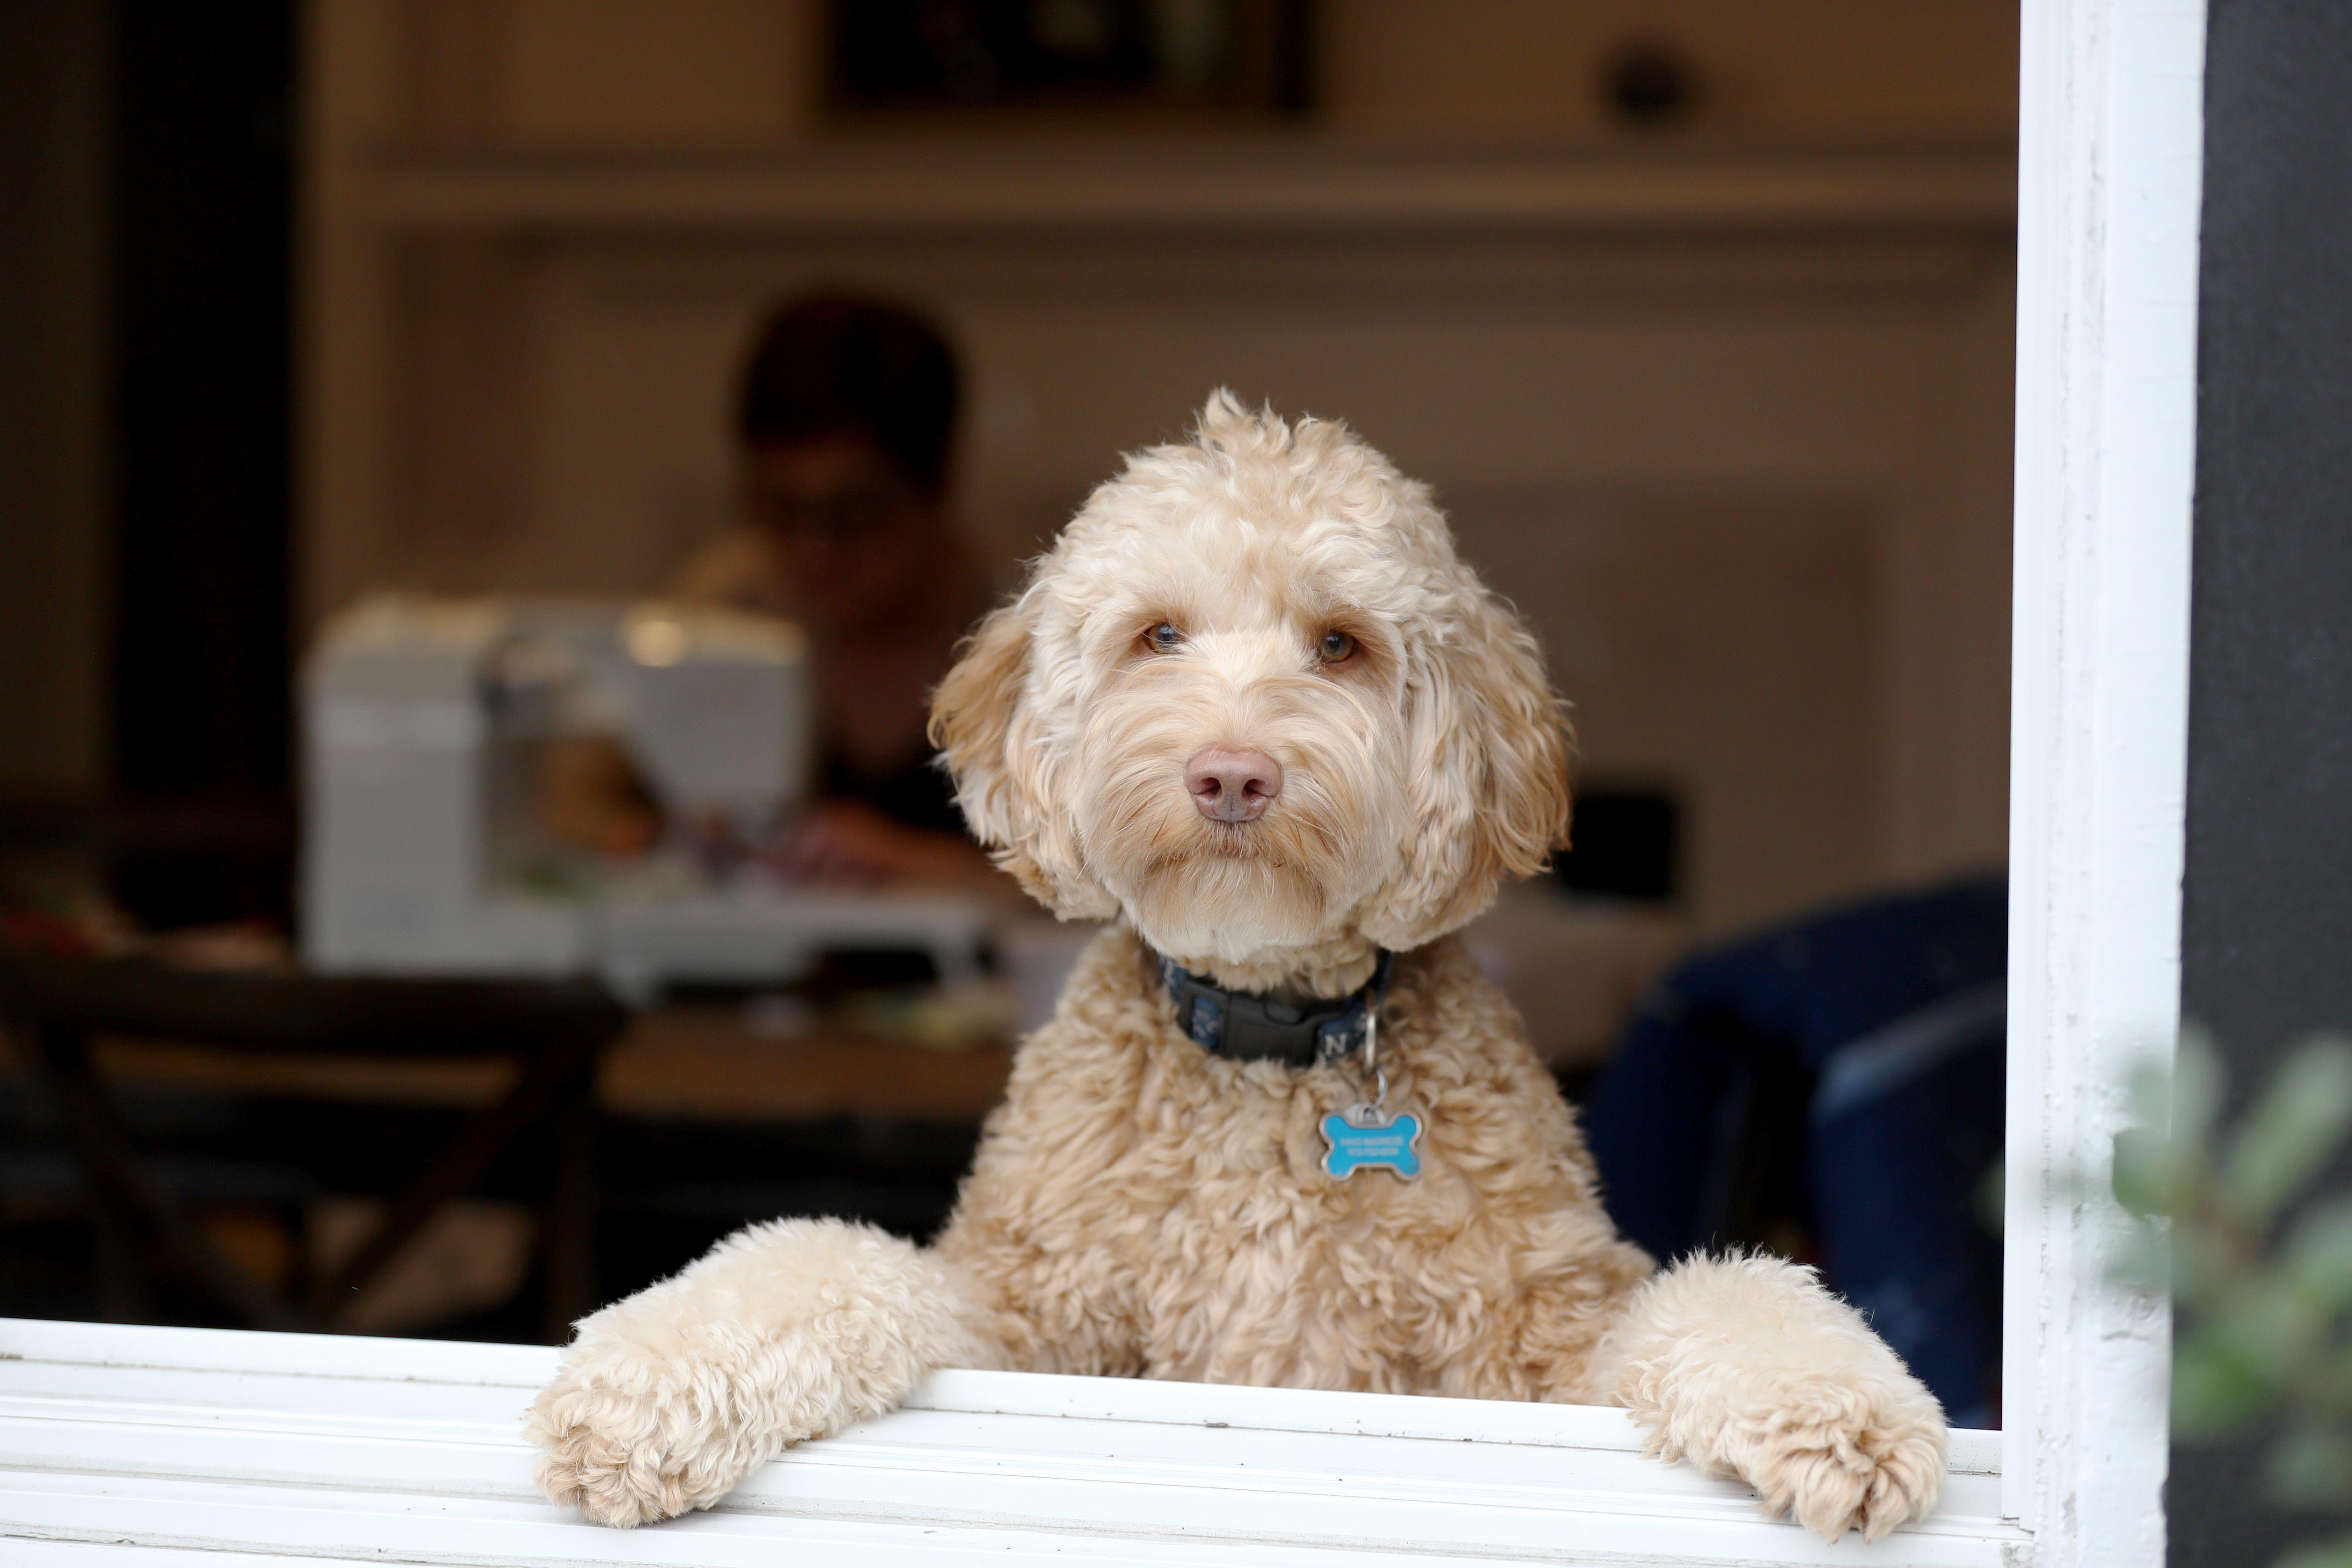 bol.com | Dog Man 6, Dav Pilkey | 9781338236576 | Boeken | 3648x5472